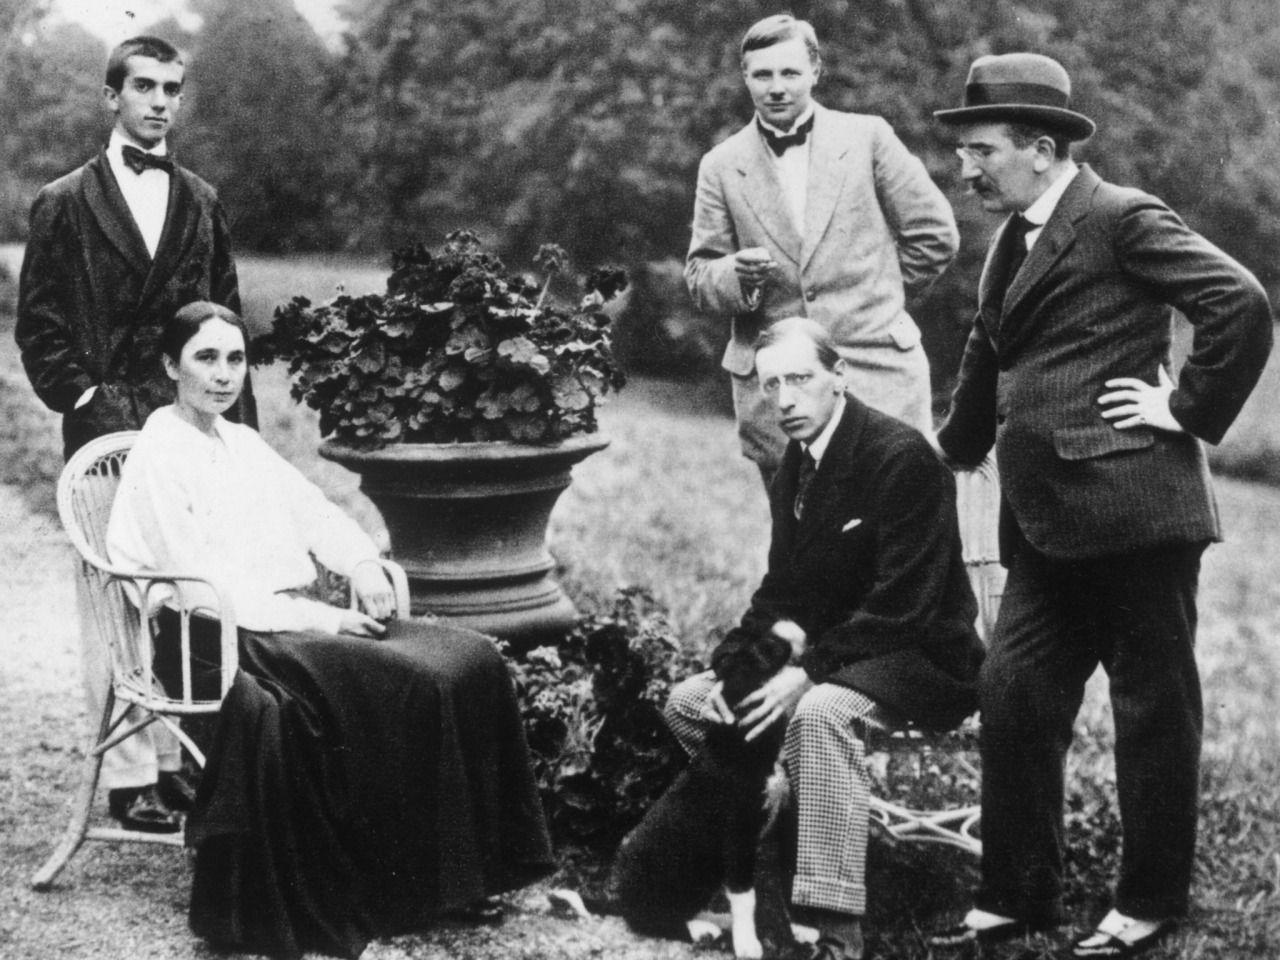 Natalia Goncharova, Igor Stravinsky, Léonide Massine, Mikhail Larionov and Léon Bakst at Diaghilev's house in Ouchy, Switzerland. Summer of 1915.